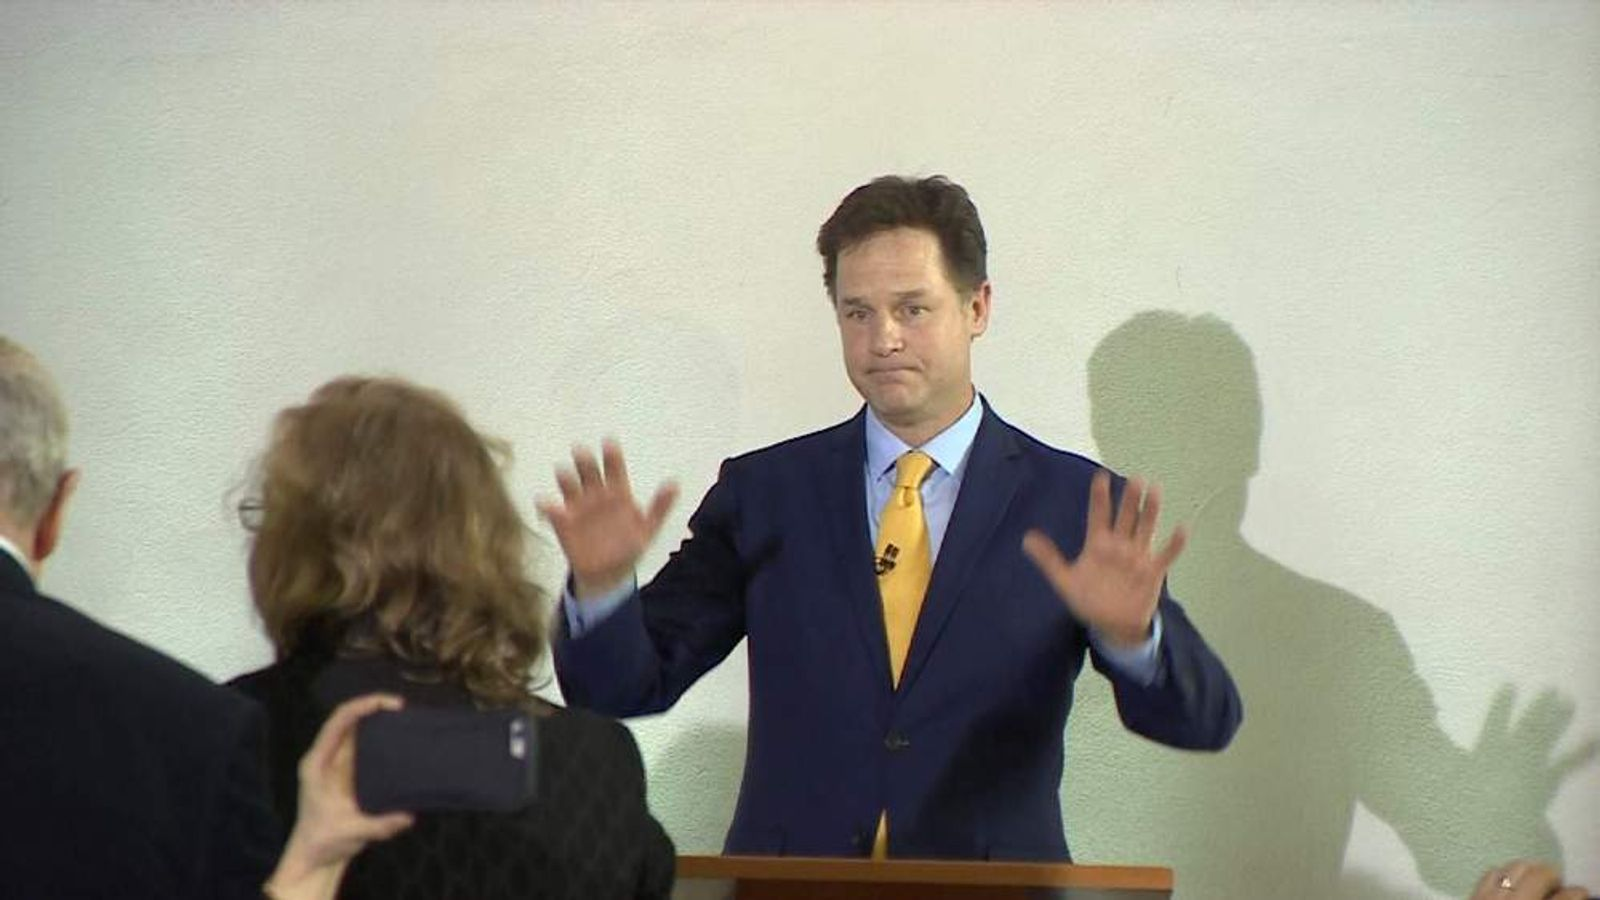 Nick Clegg resigns